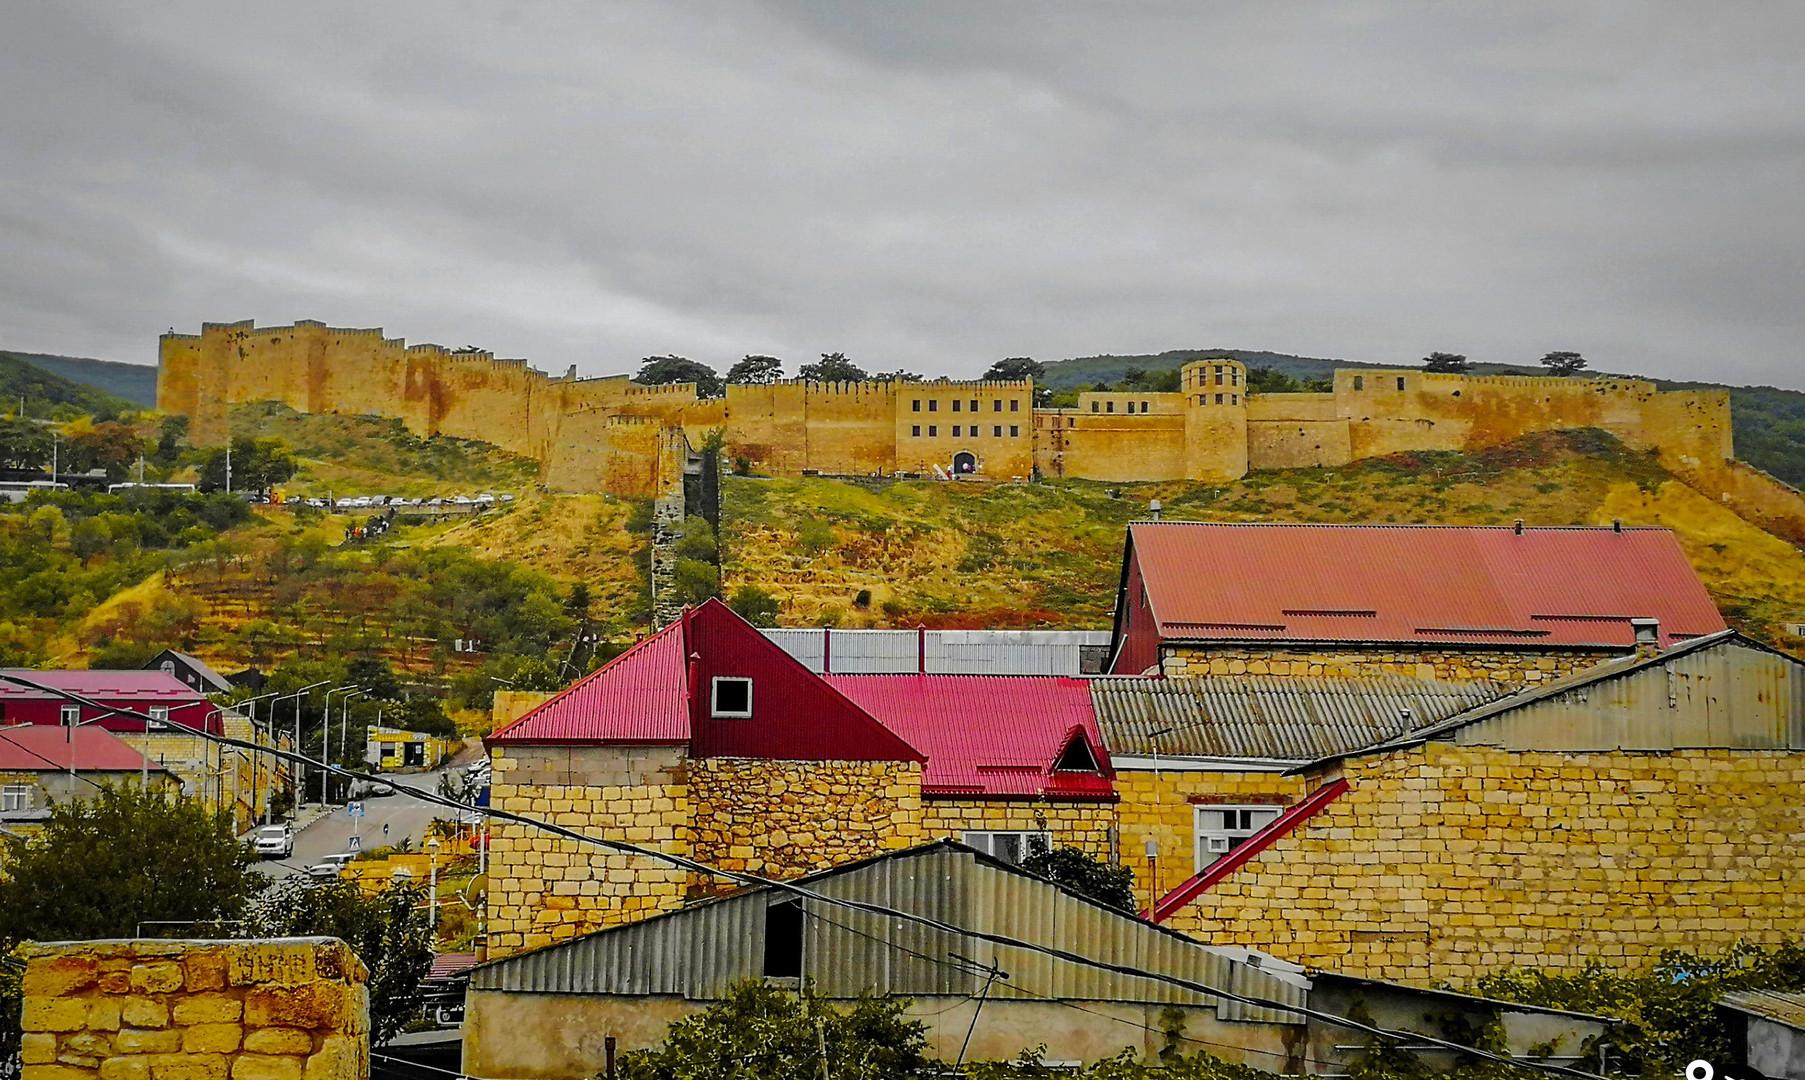 Панорама крепости Нарын-Кала, Дербент